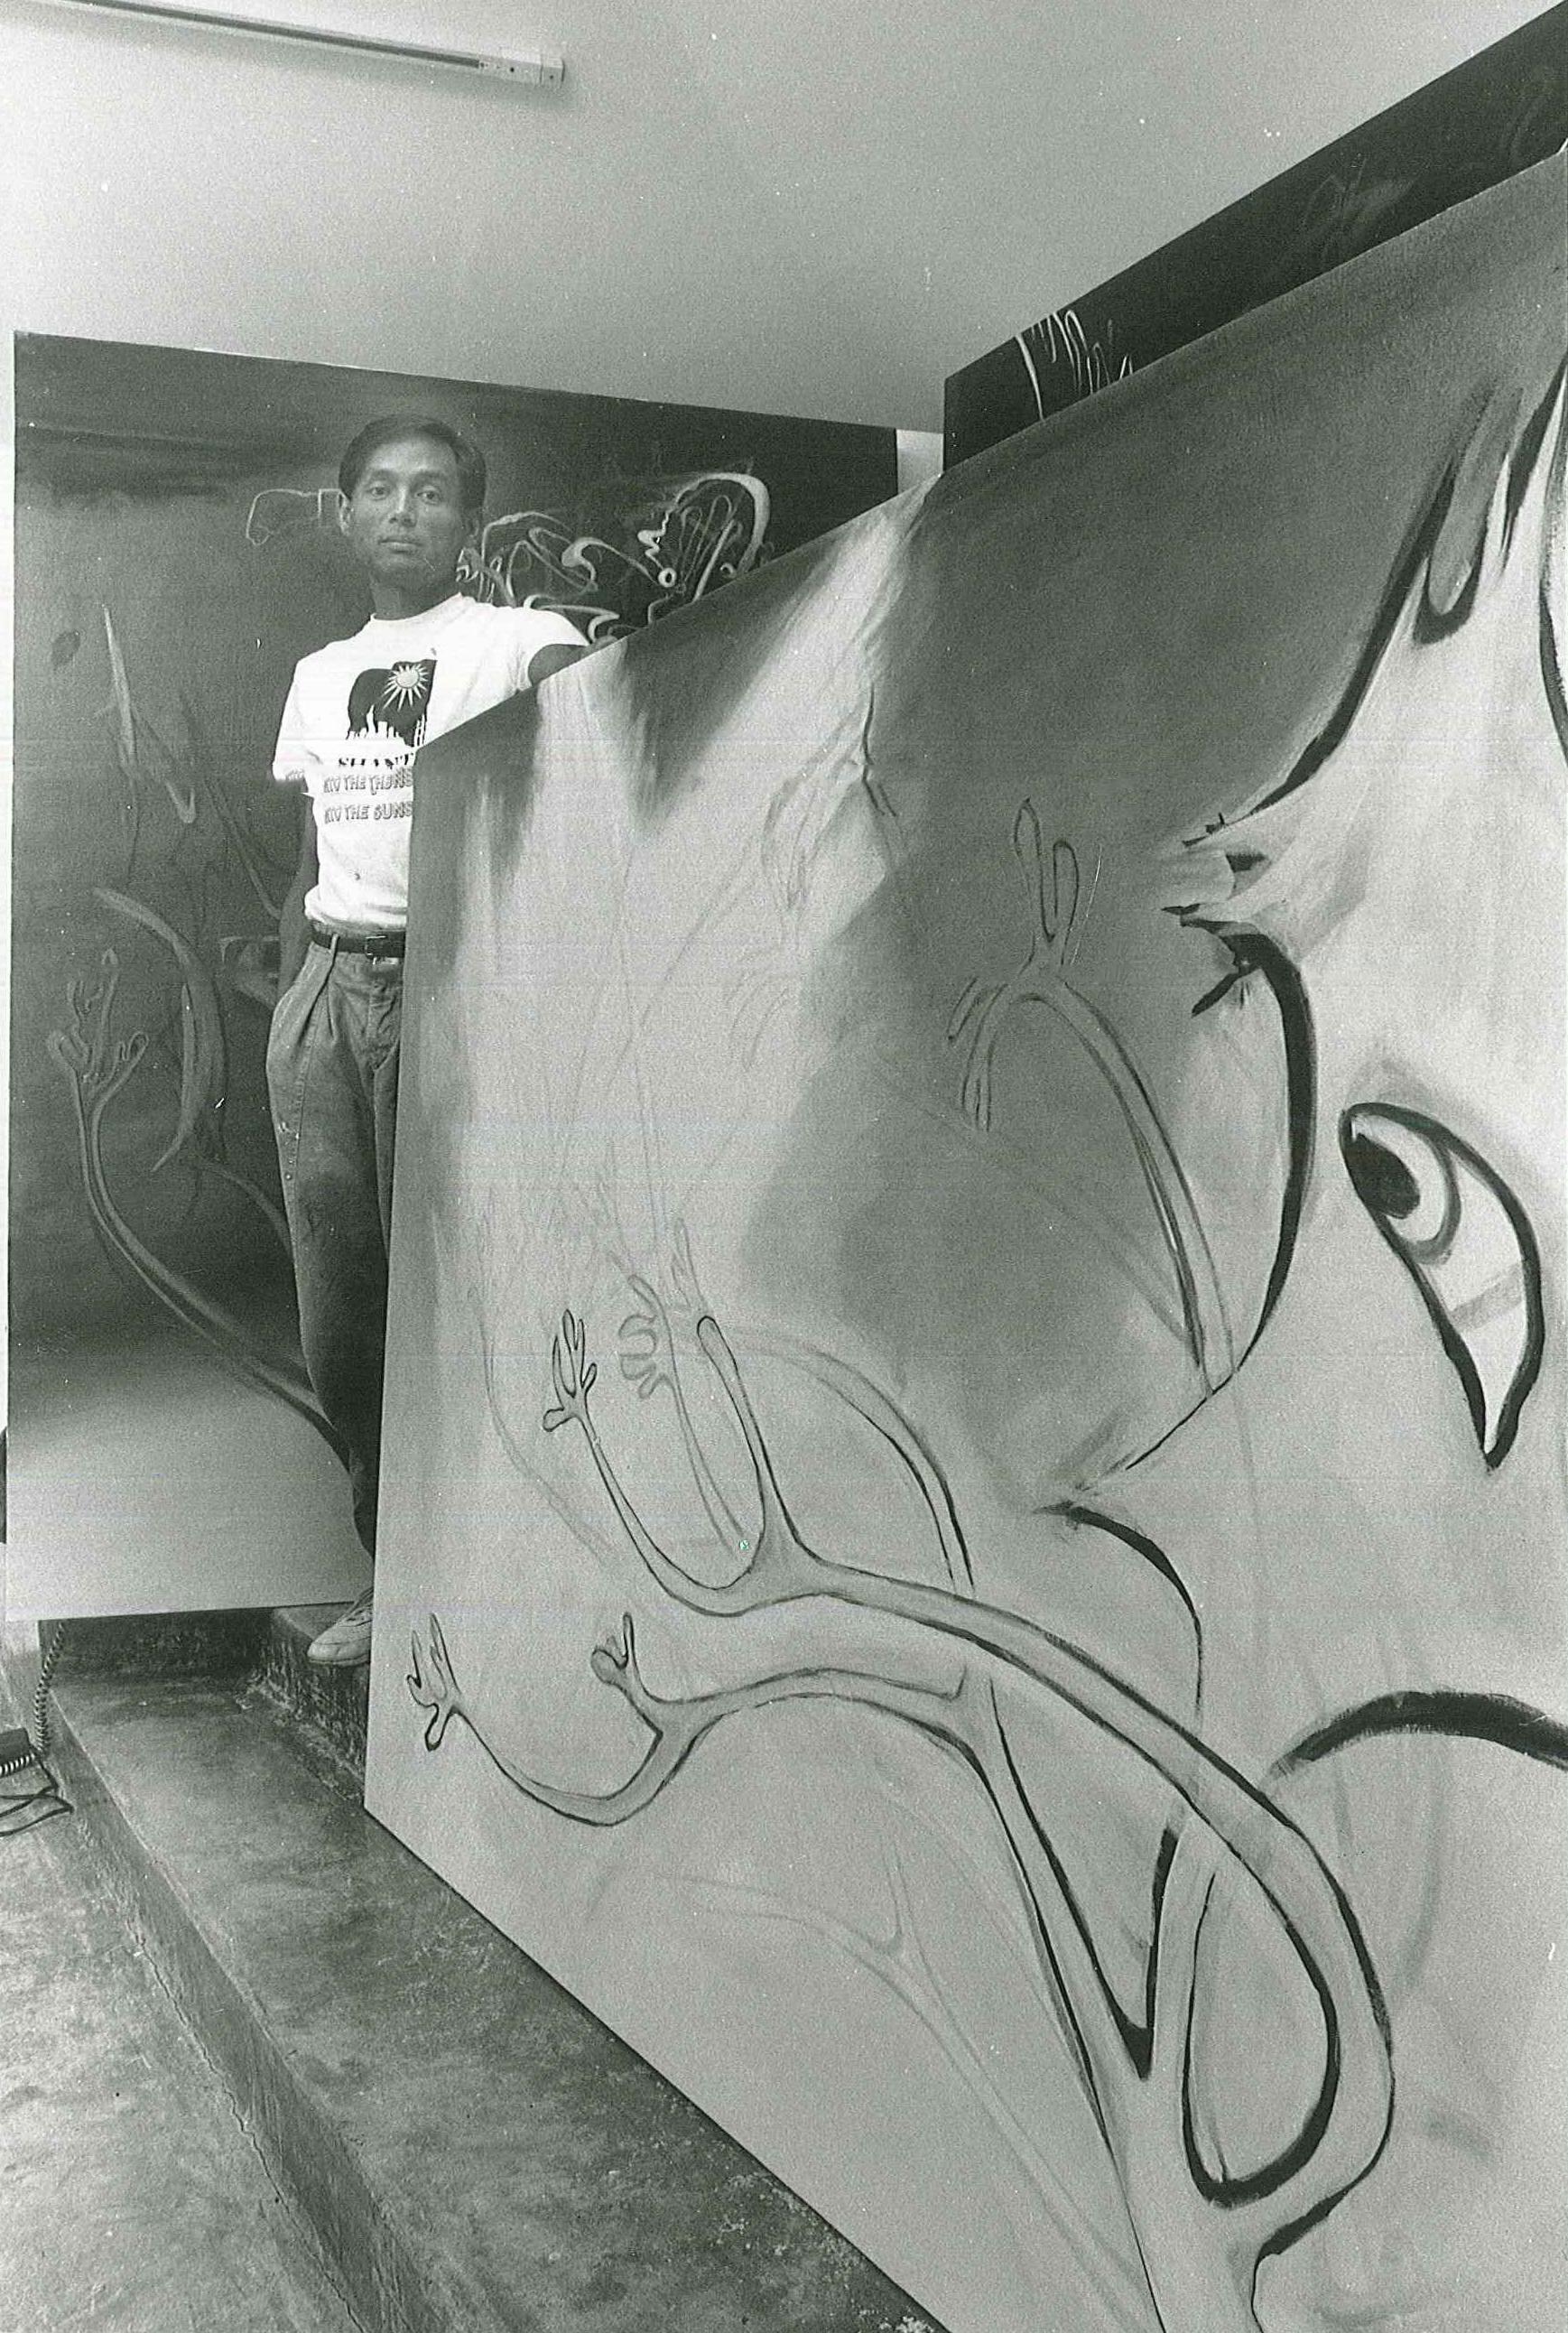 Ed in his studio. Courtesy of the Estate of Ed Aulerich-Sugai.